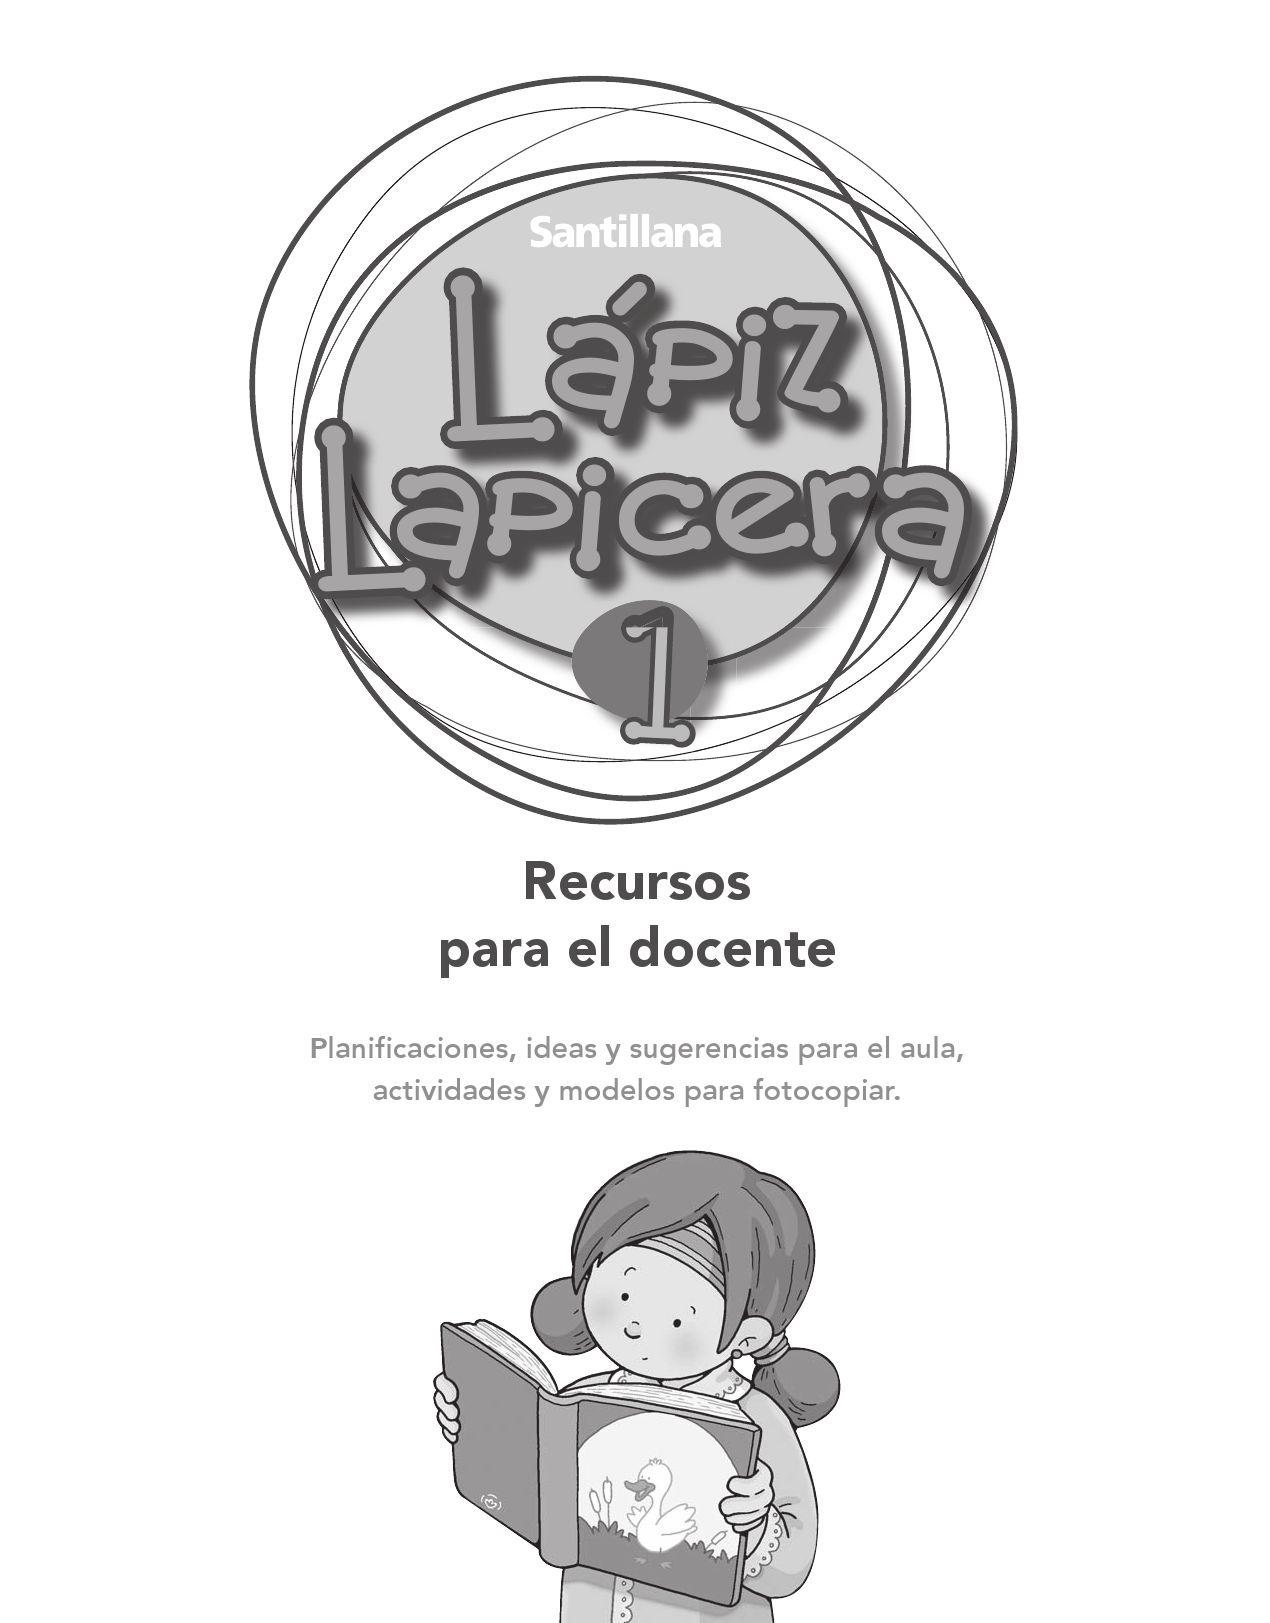 Lapiz Lapicera Integrado 1 by Marcela Lalia - issuu